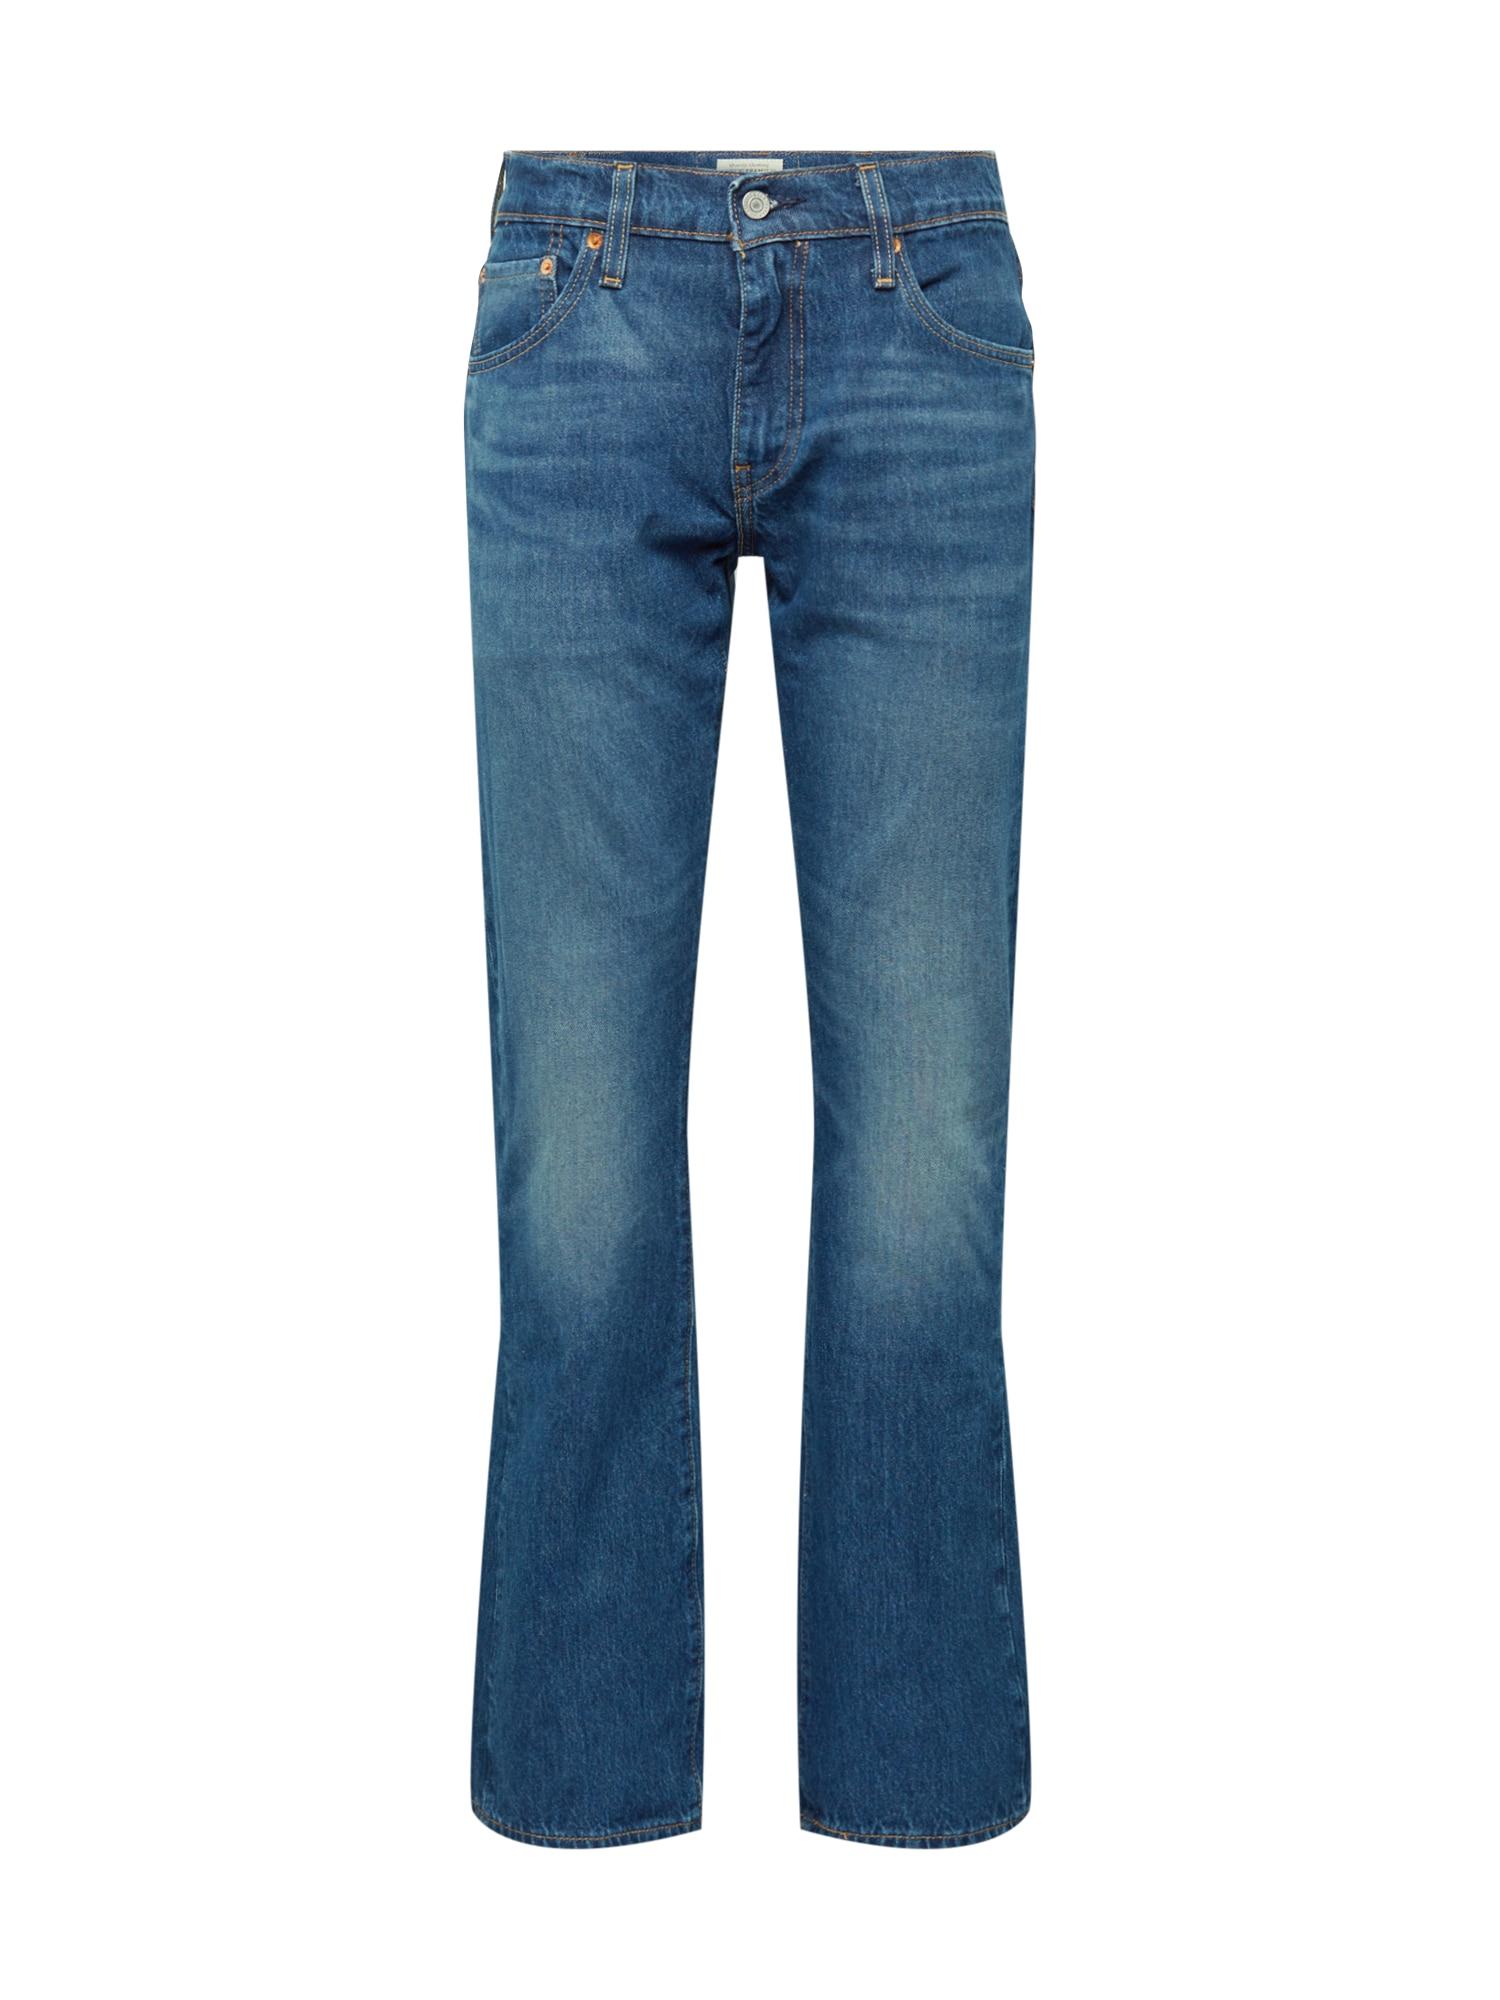 LEVI'S Džinsai '527™ SLIM BOOT CUT' tamsiai (džinso) mėlyna